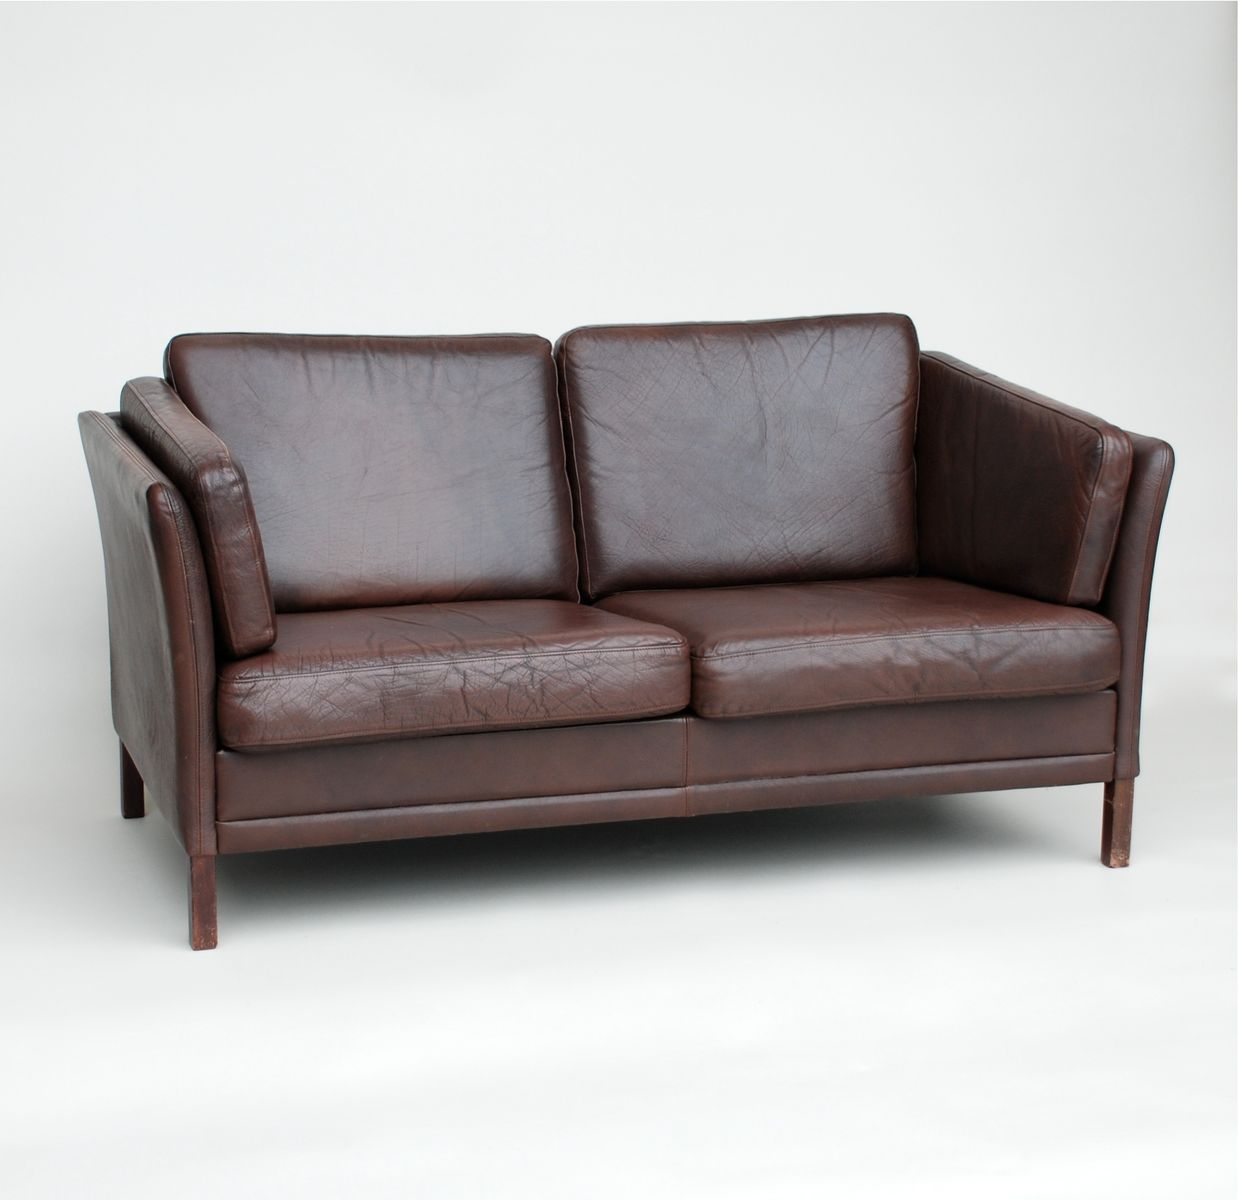 danish dark brown leather sofa 1970s for sale at pamono. Black Bedroom Furniture Sets. Home Design Ideas